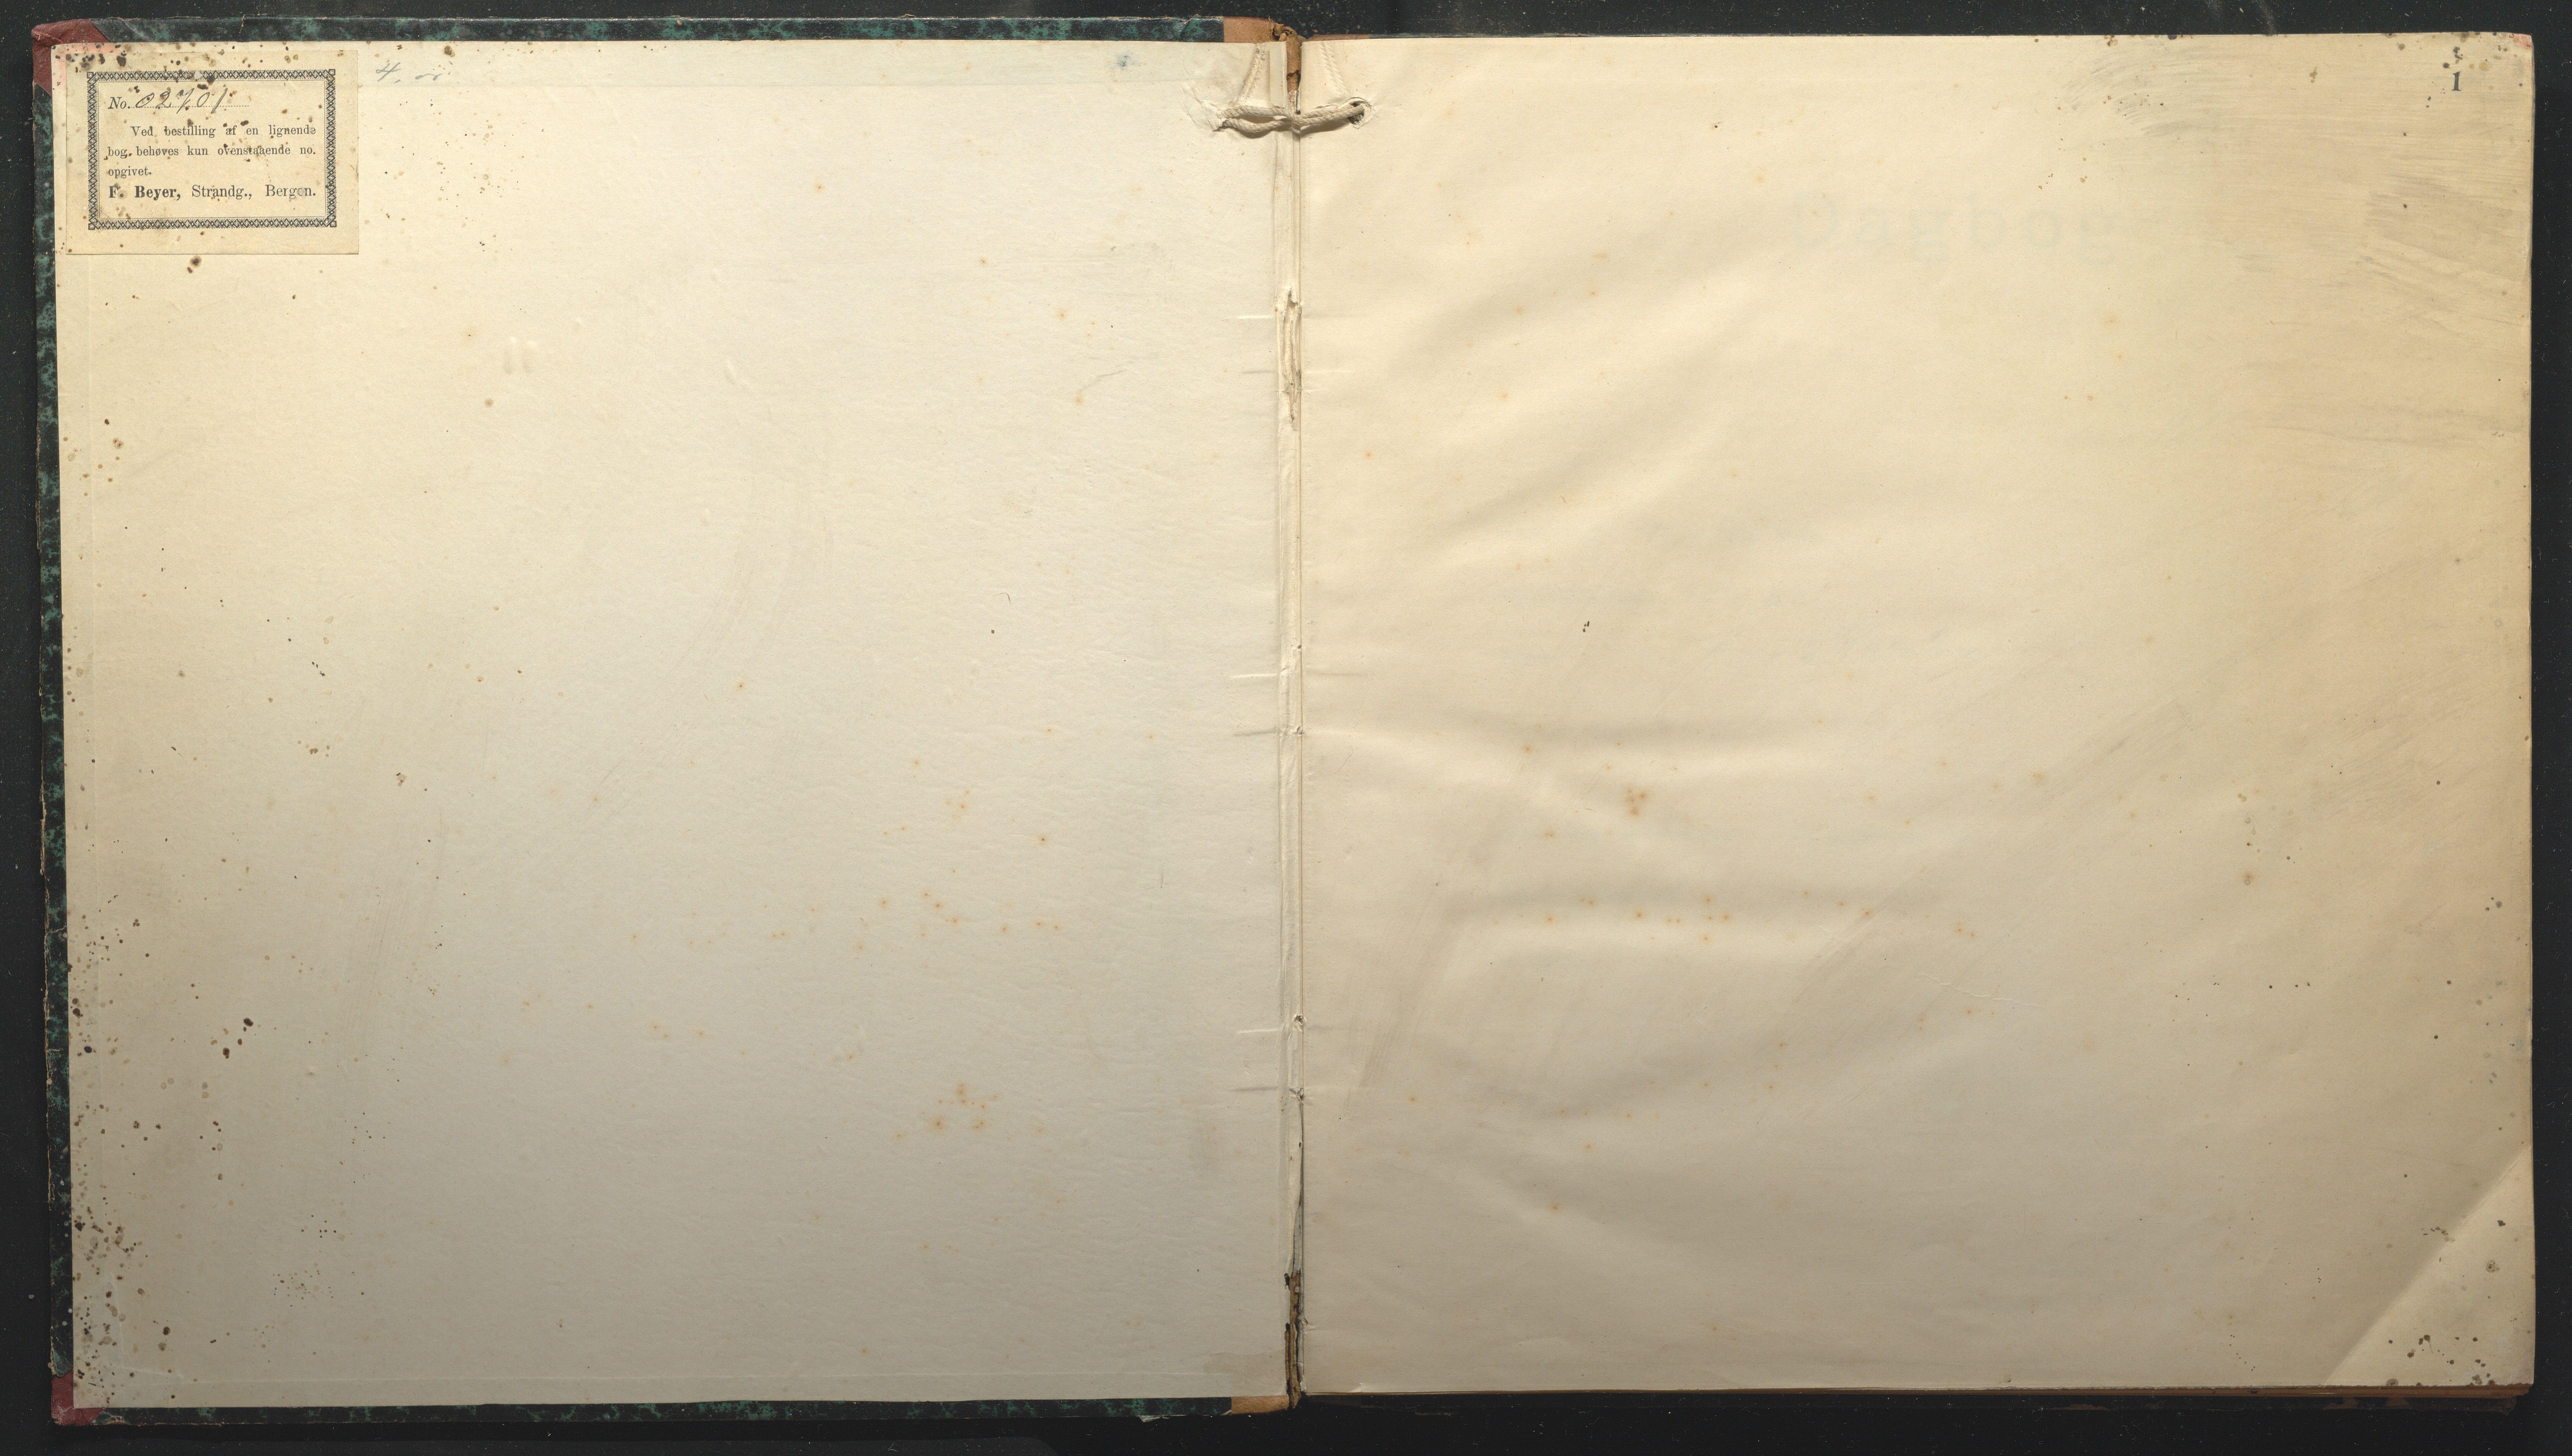 AAKS, Fartøysarkivet, F/L0127: Fides (brigg), 1896-1897, s. 1